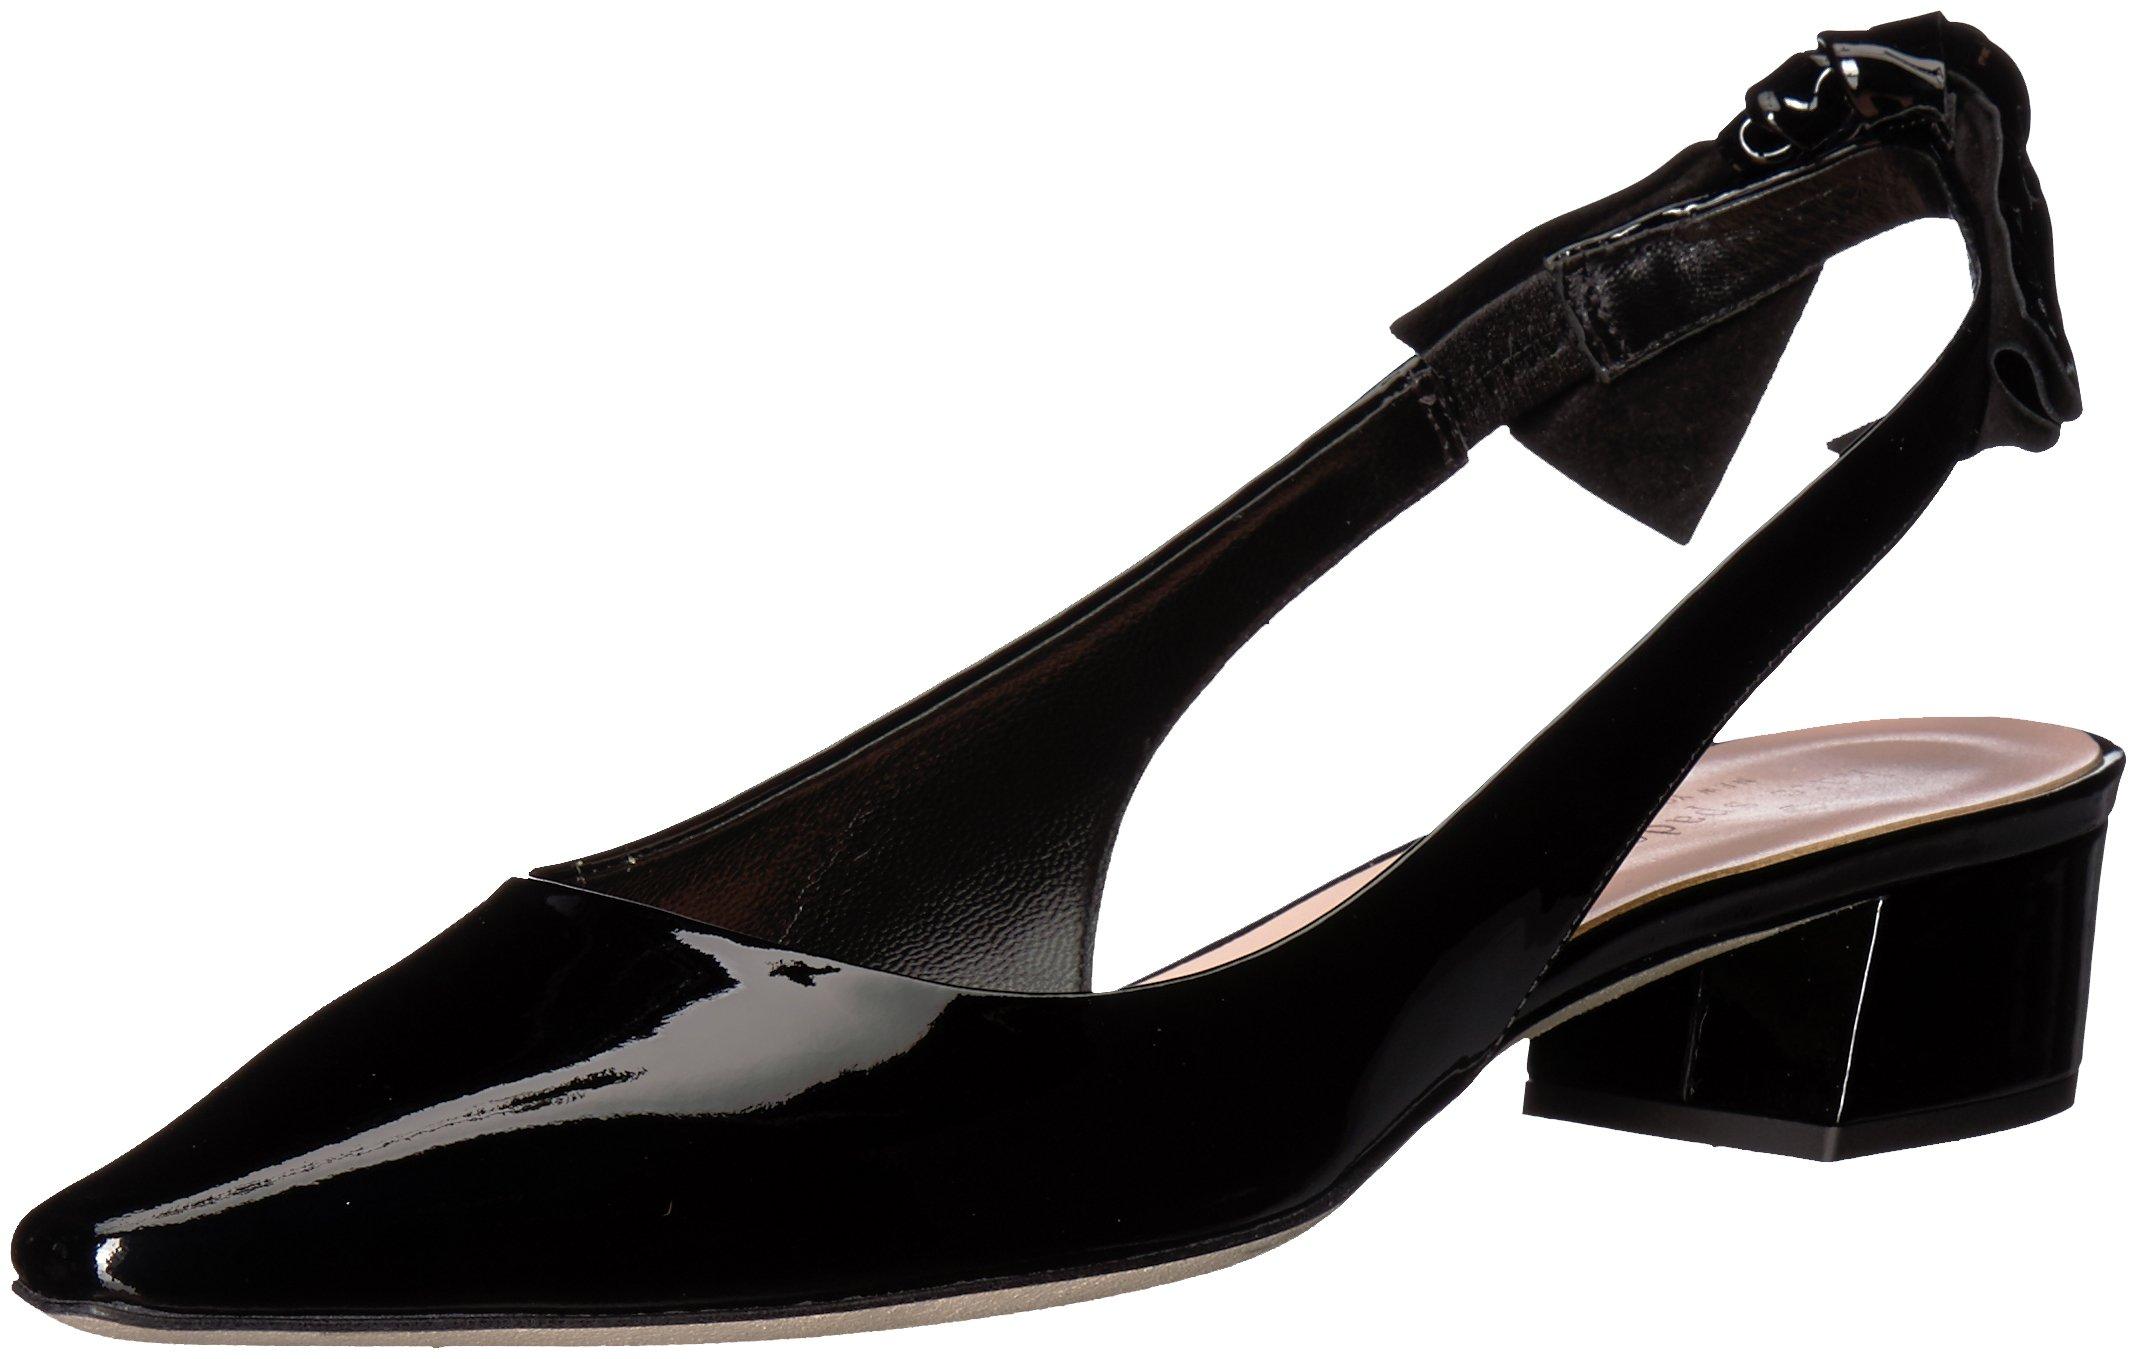 Kate Spade New York Women's Lucia Heeled Sandal, Black Patent, 9 Medium US by Kate Spade New York